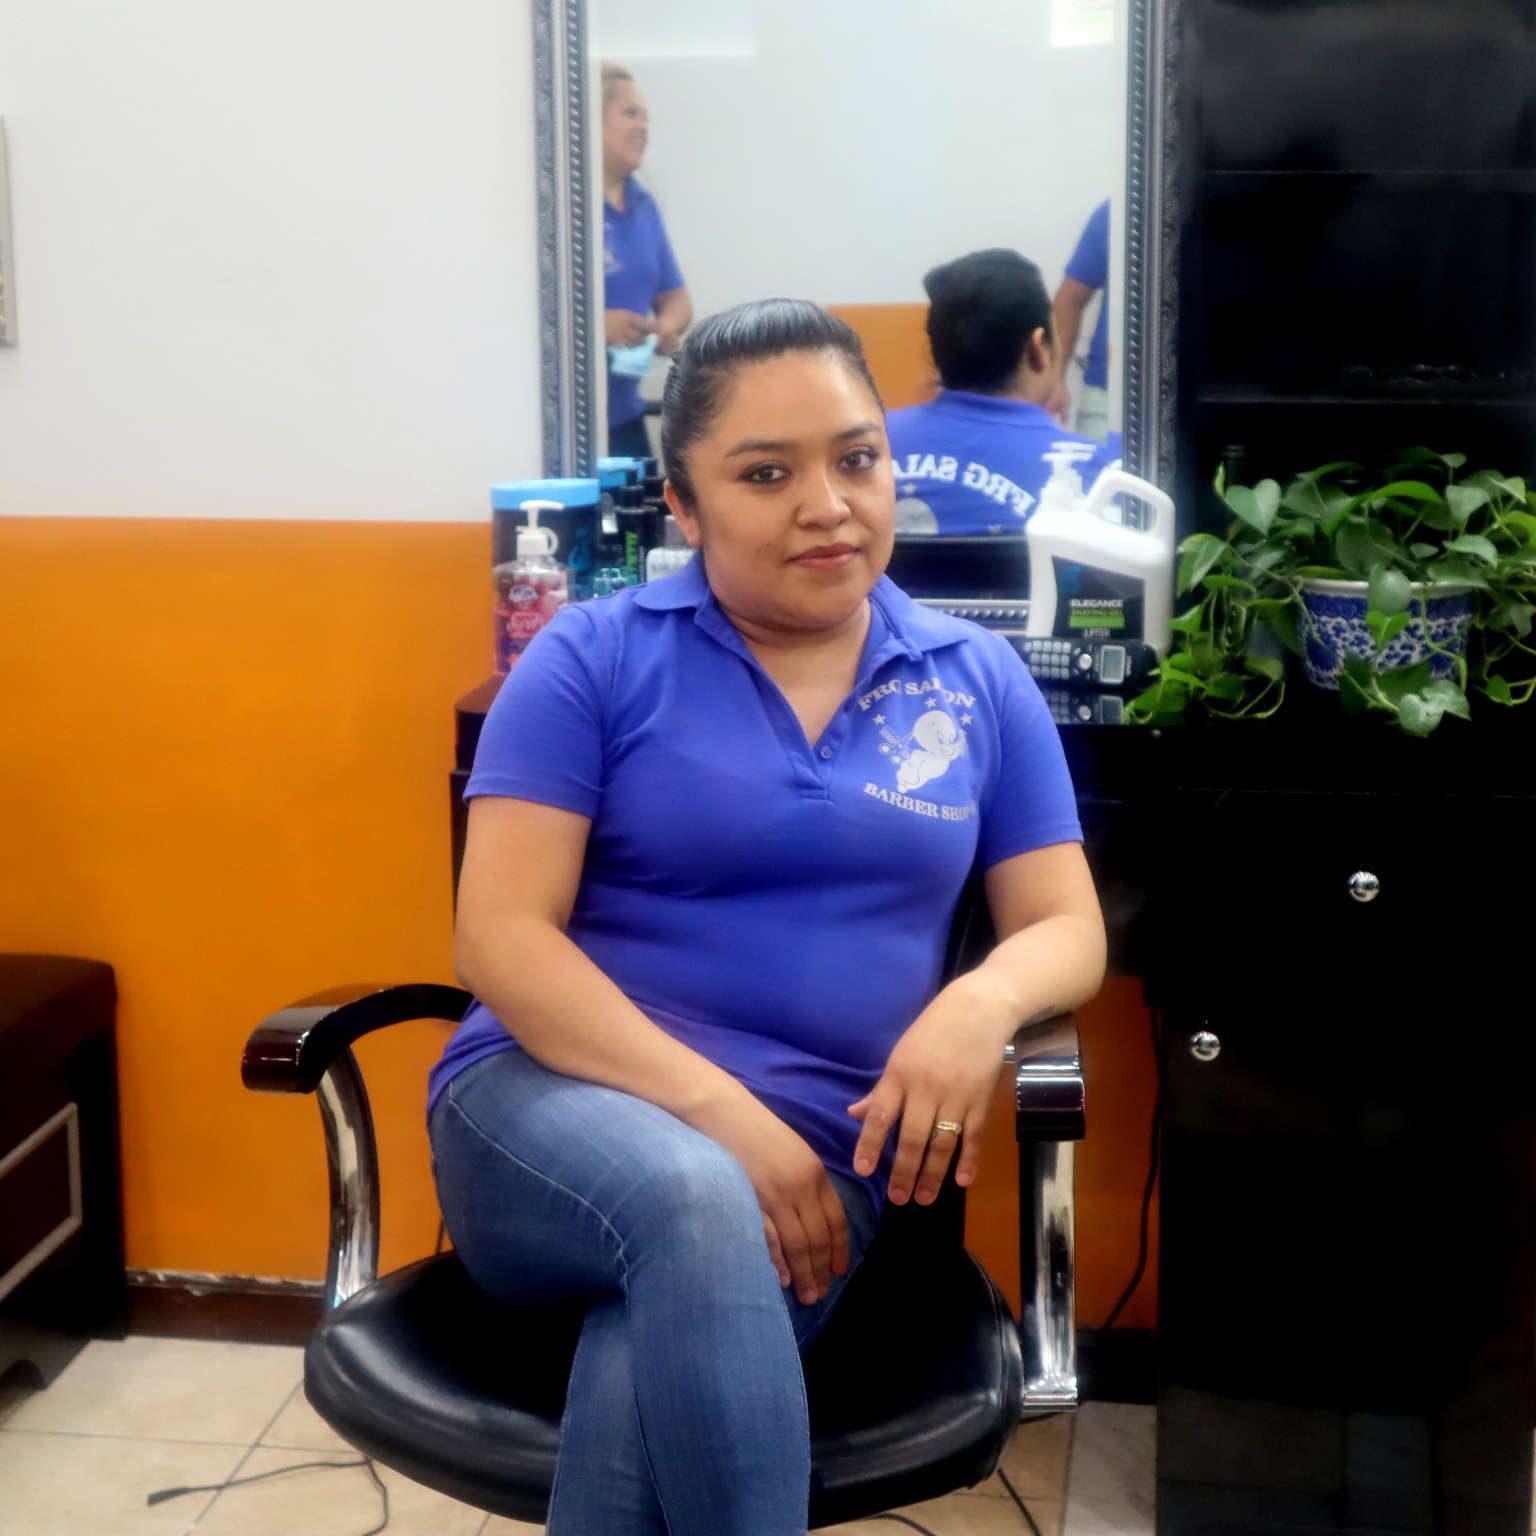 Mariela head stylist